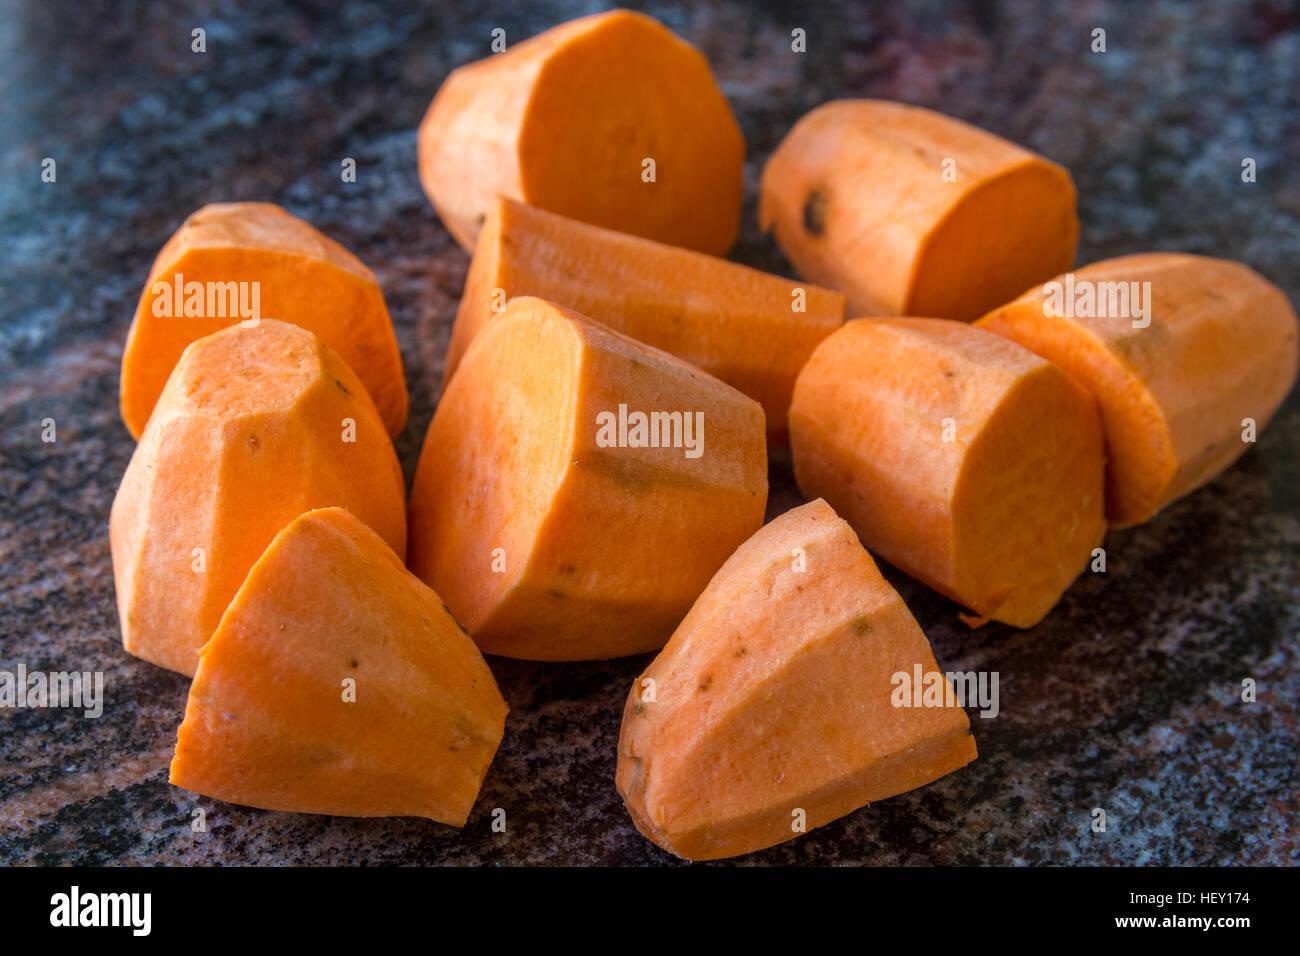 pieces of chopped sweet potato - Stock Image